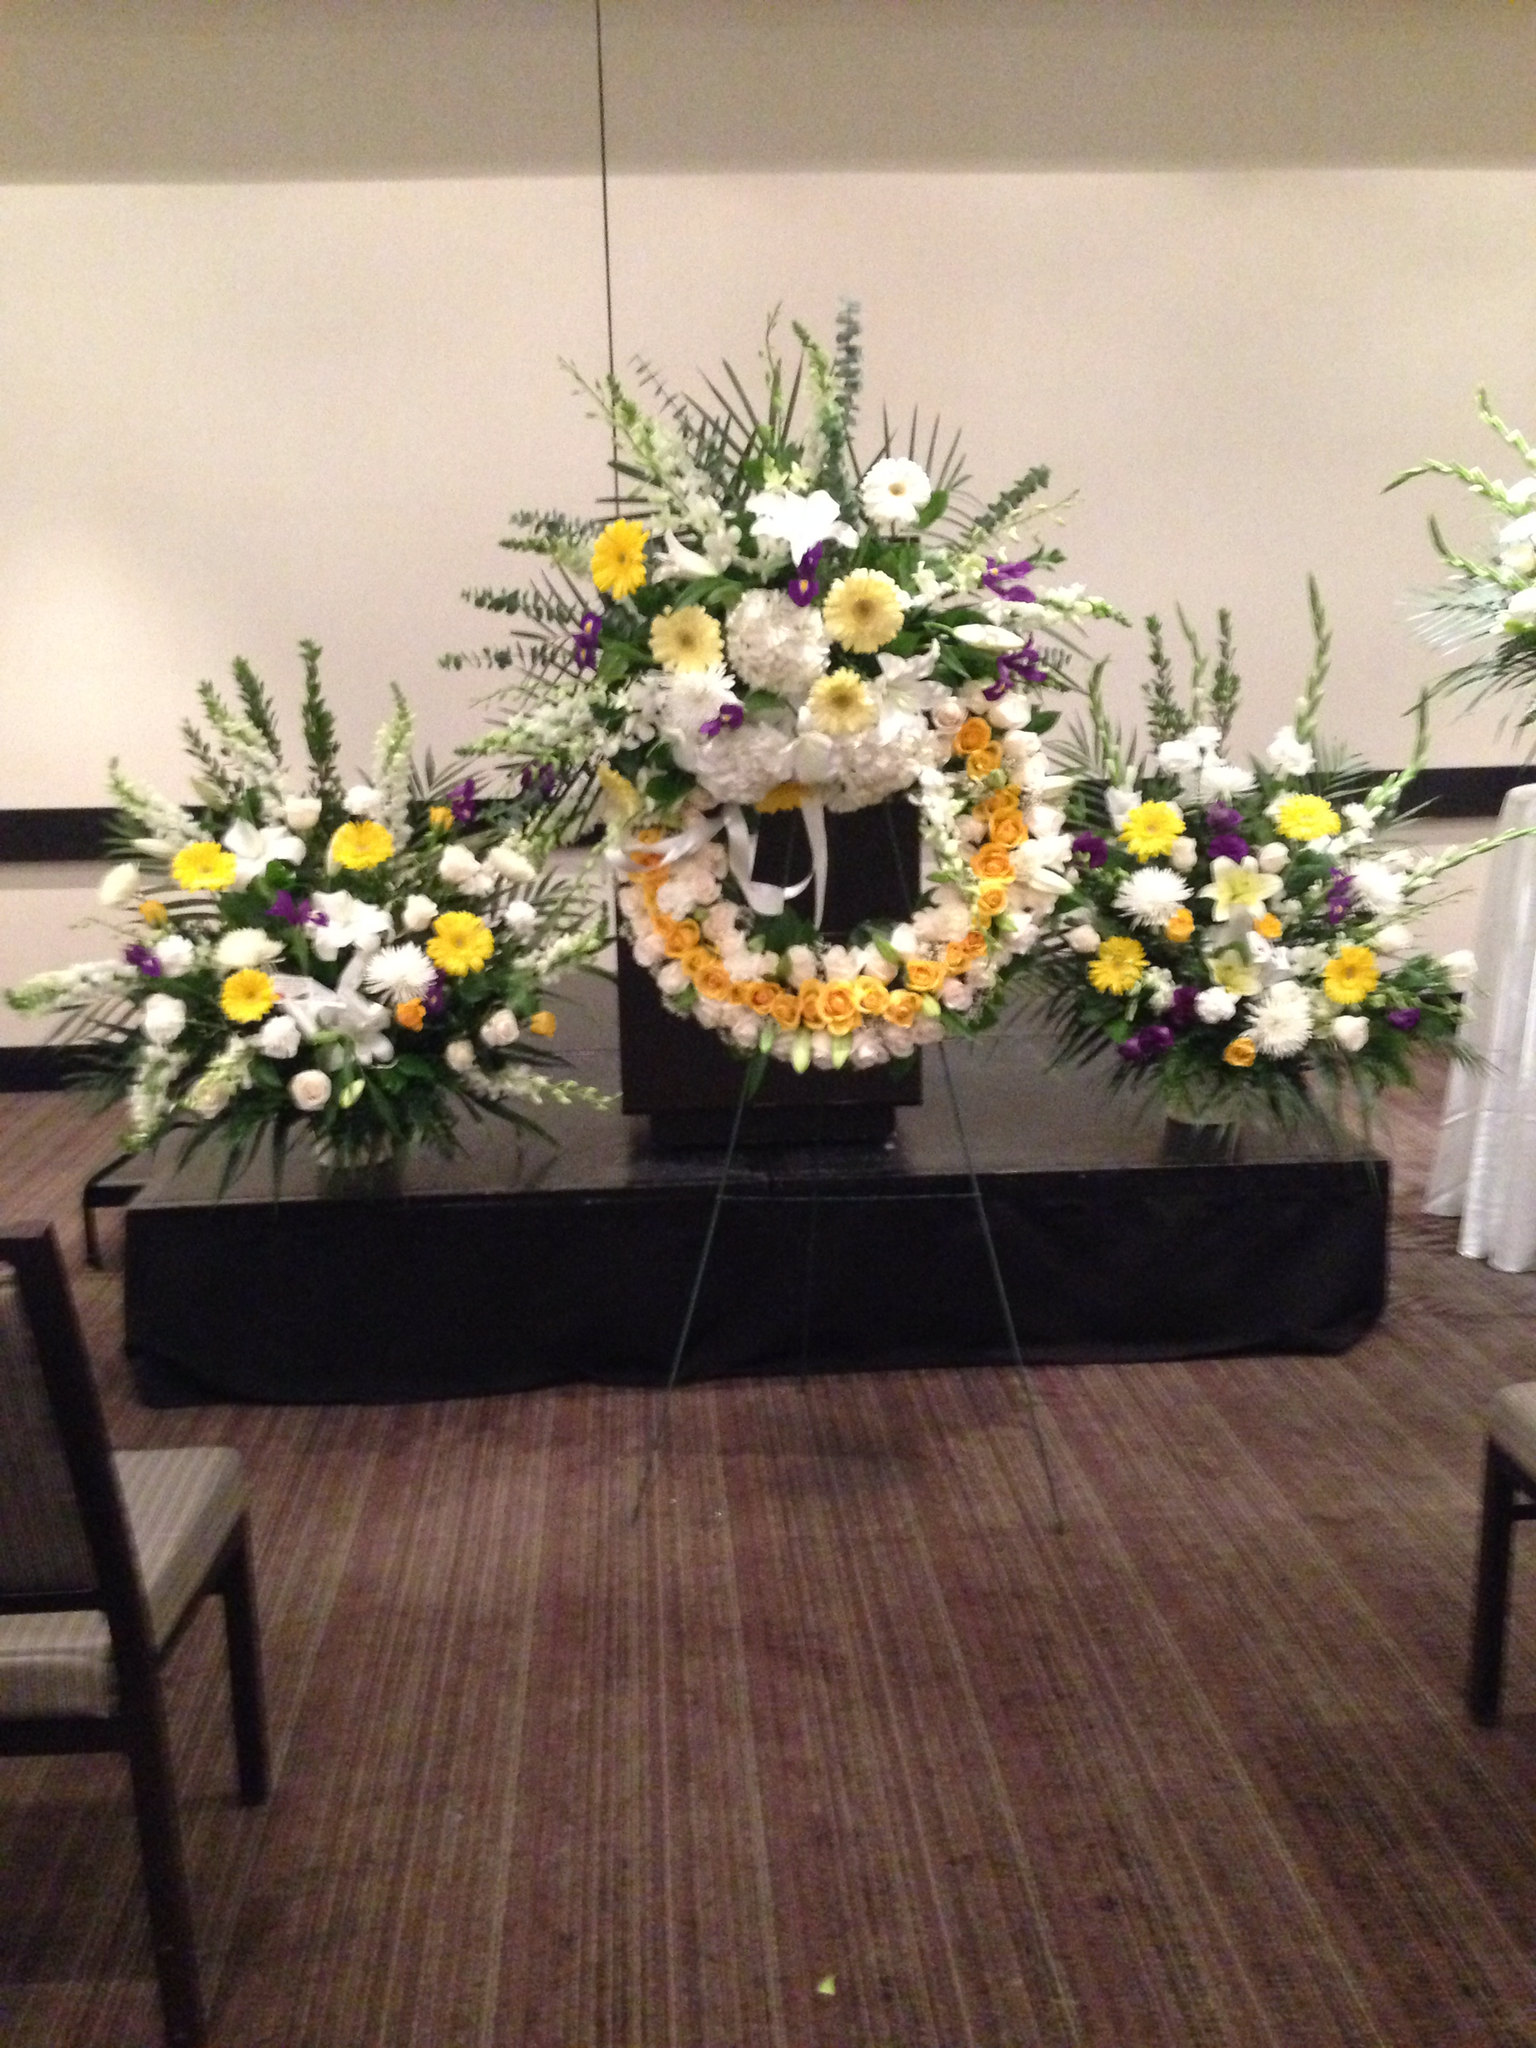 Farah florist